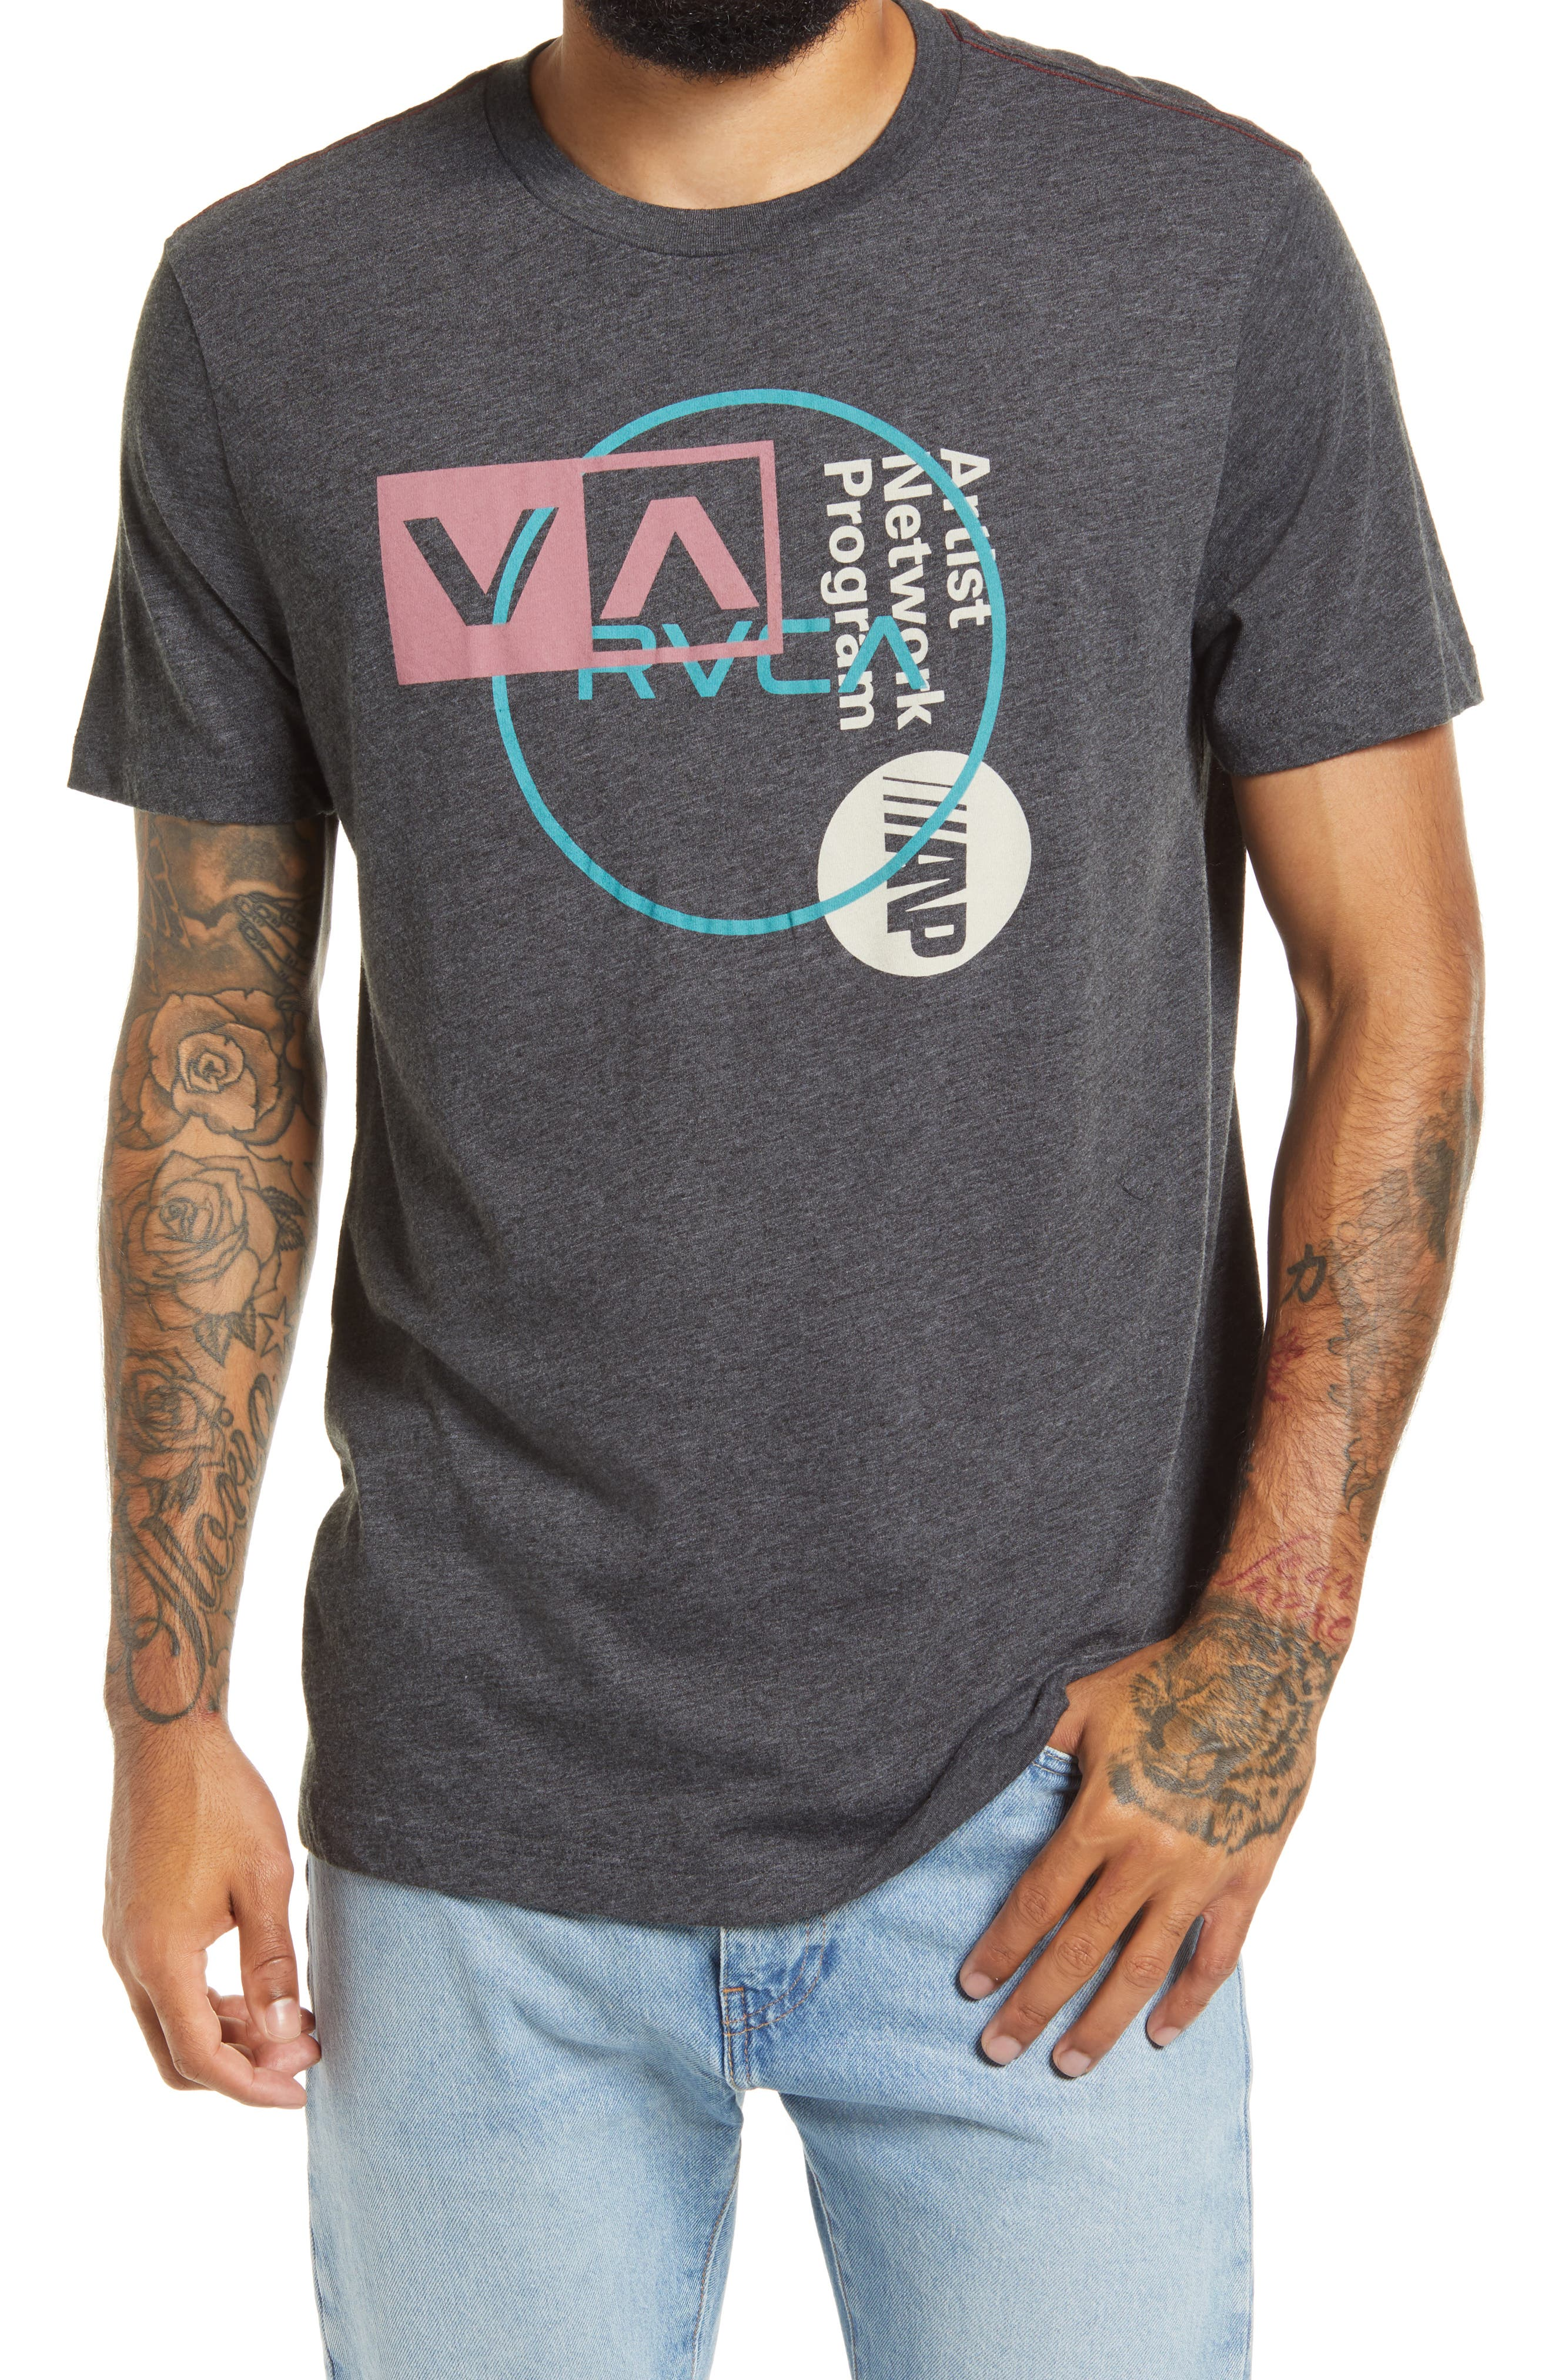 RVCA Boys Big MayDay Short Sleeve Crew Neck T-Shirt